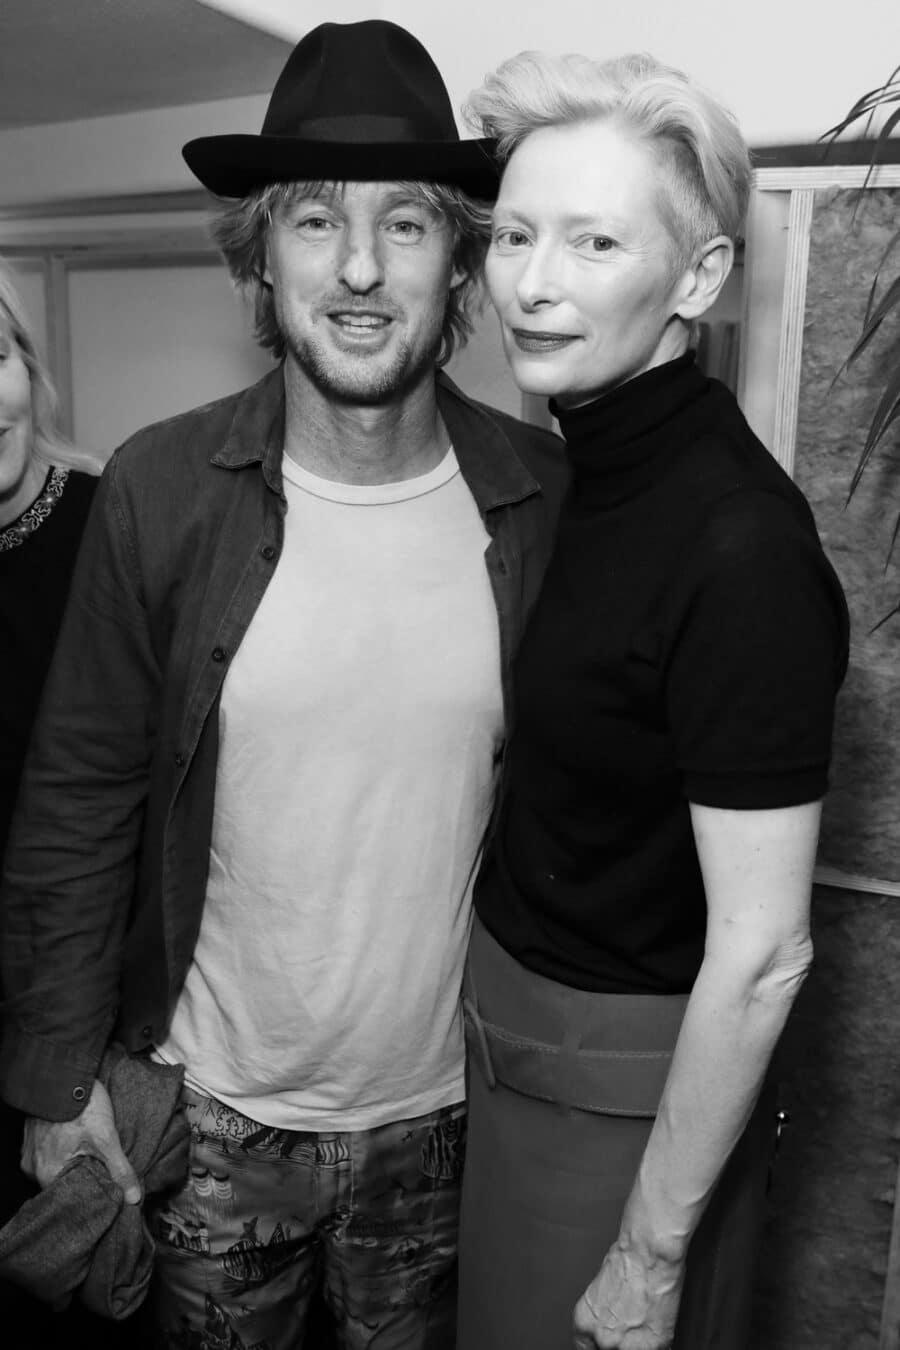 Owen Wilson & Tilda